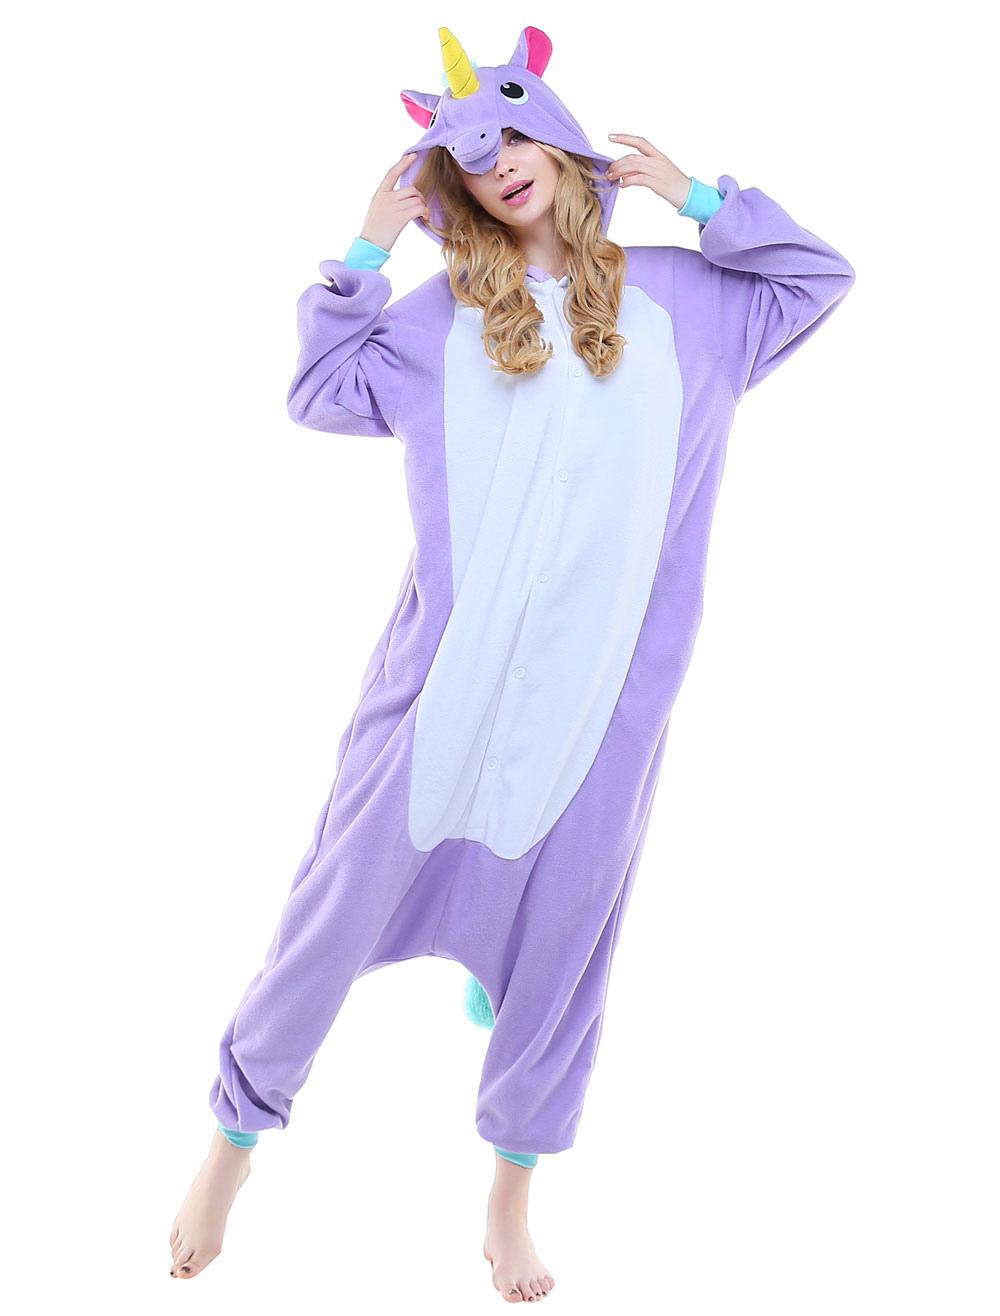 ... Kigurumi Pajama Licorne Unicorn Onesie Adults Unisex Flannel Animal  Costume Halloween-No.2 ... 6307f8066